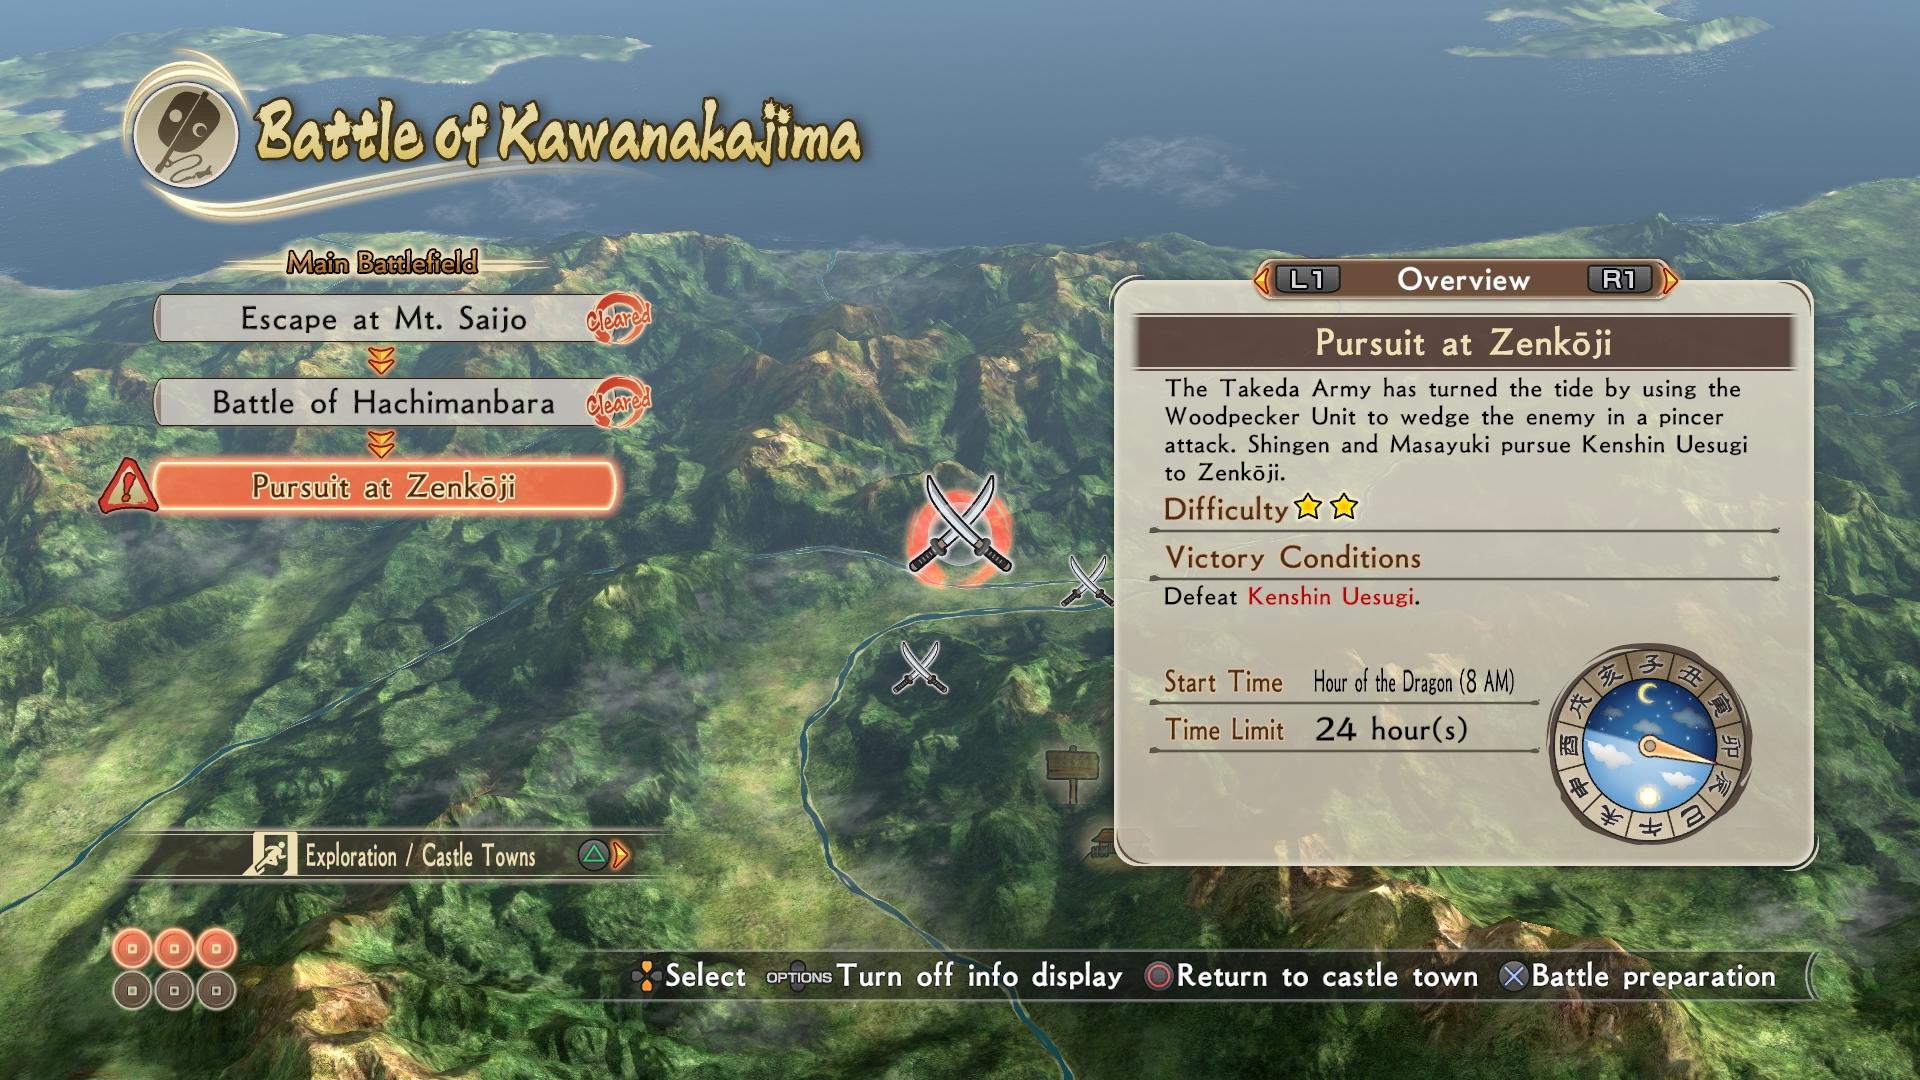 Detaily bojového systému v Samurai Warriors: Spirit of Sanada 142488